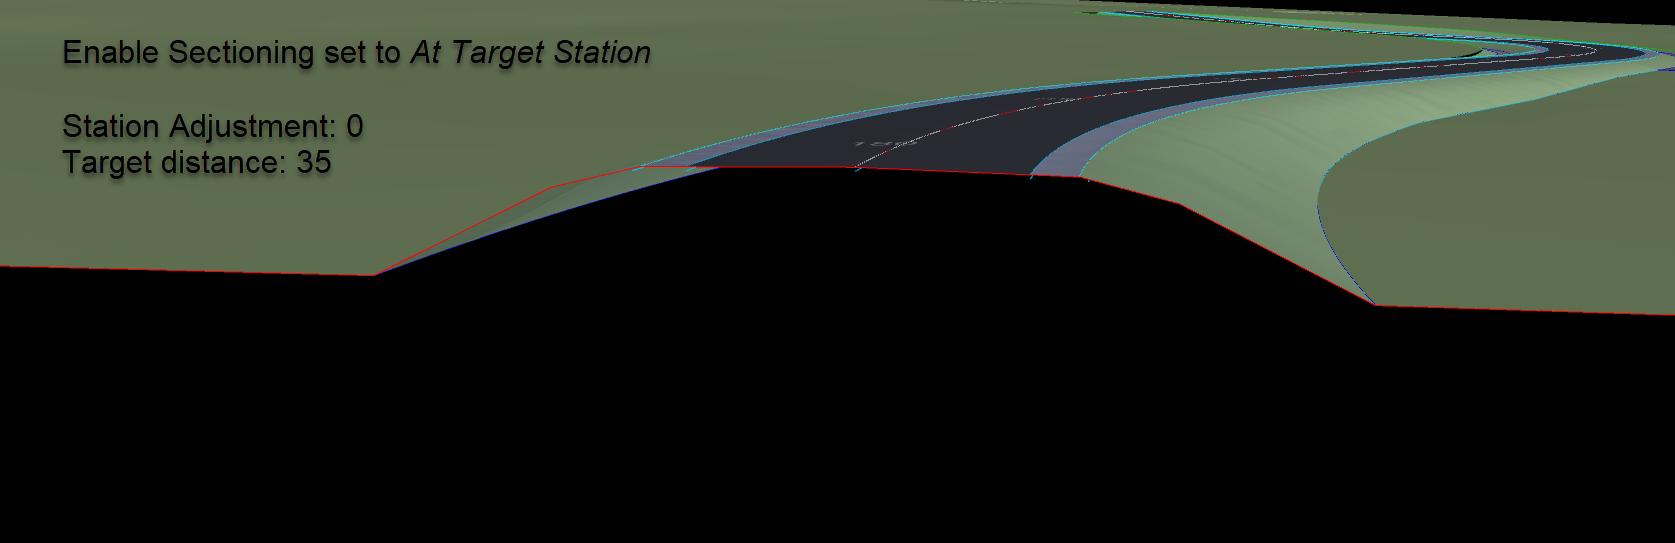 21 SEP 14 Navisworks Views for Civil 3D 8 enable sectioning set to at camera station adjustment 0